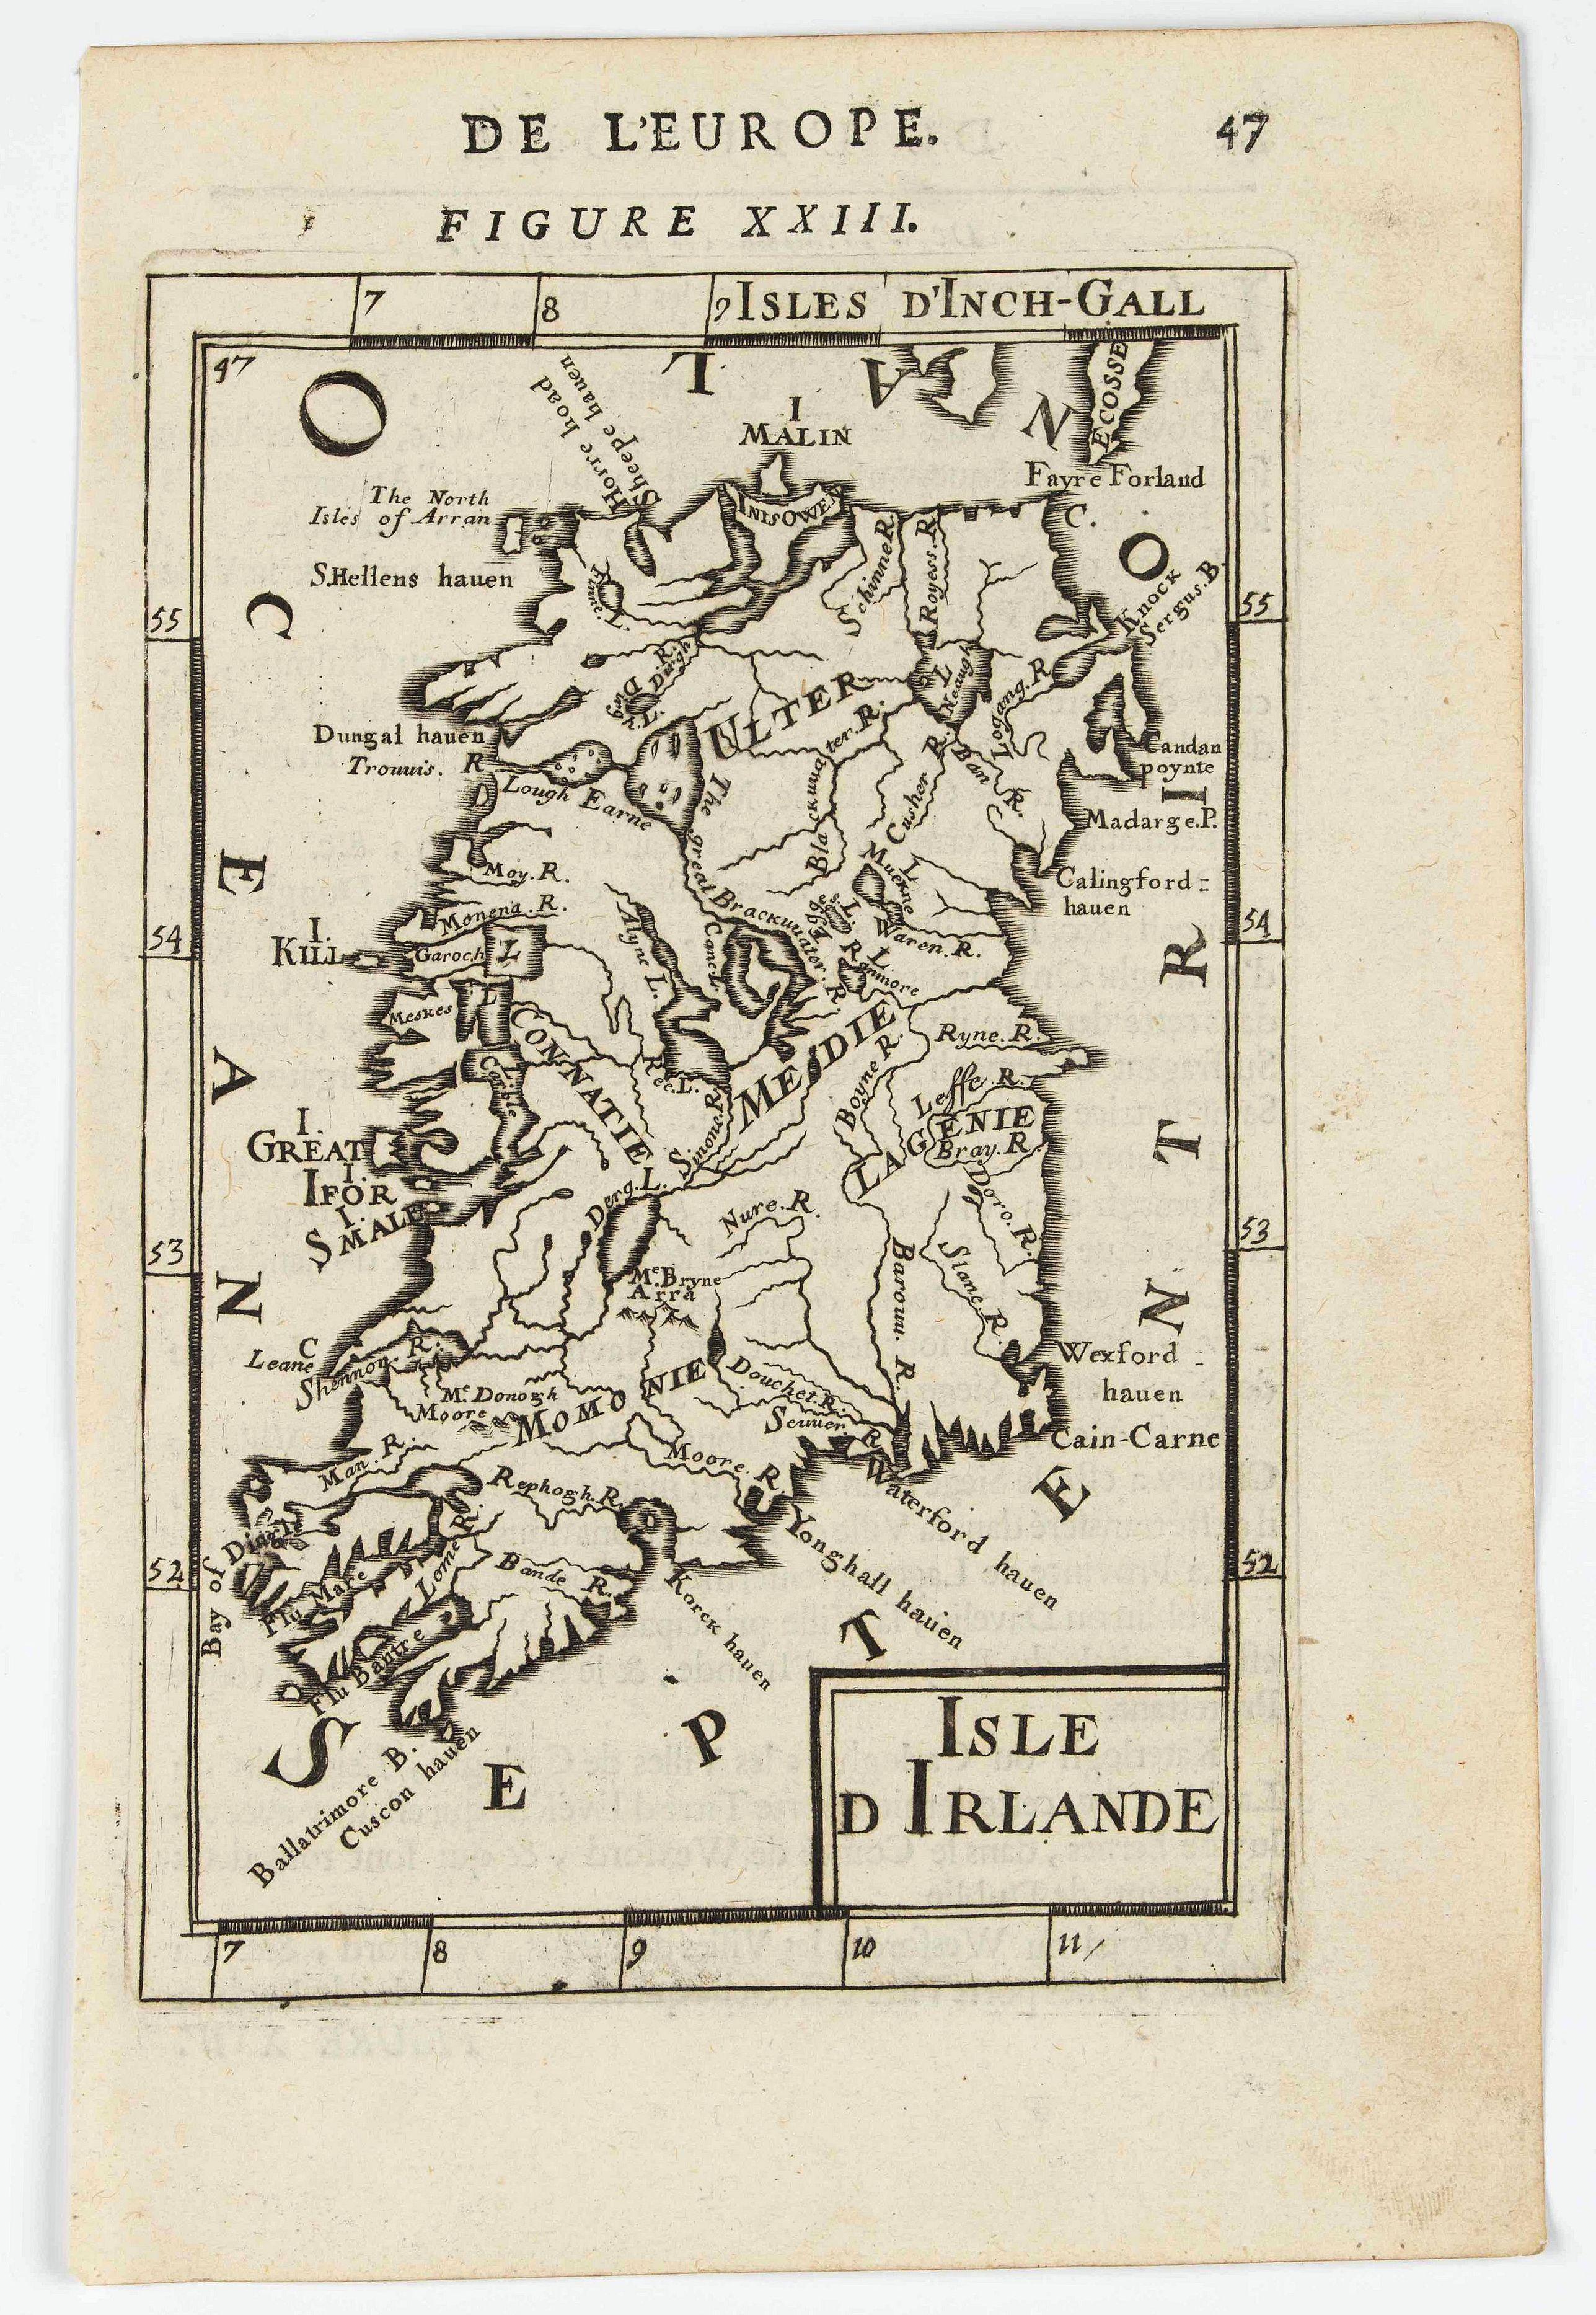 MANESSON MALLET, A. -  Isle d'Irlande (Ireland).